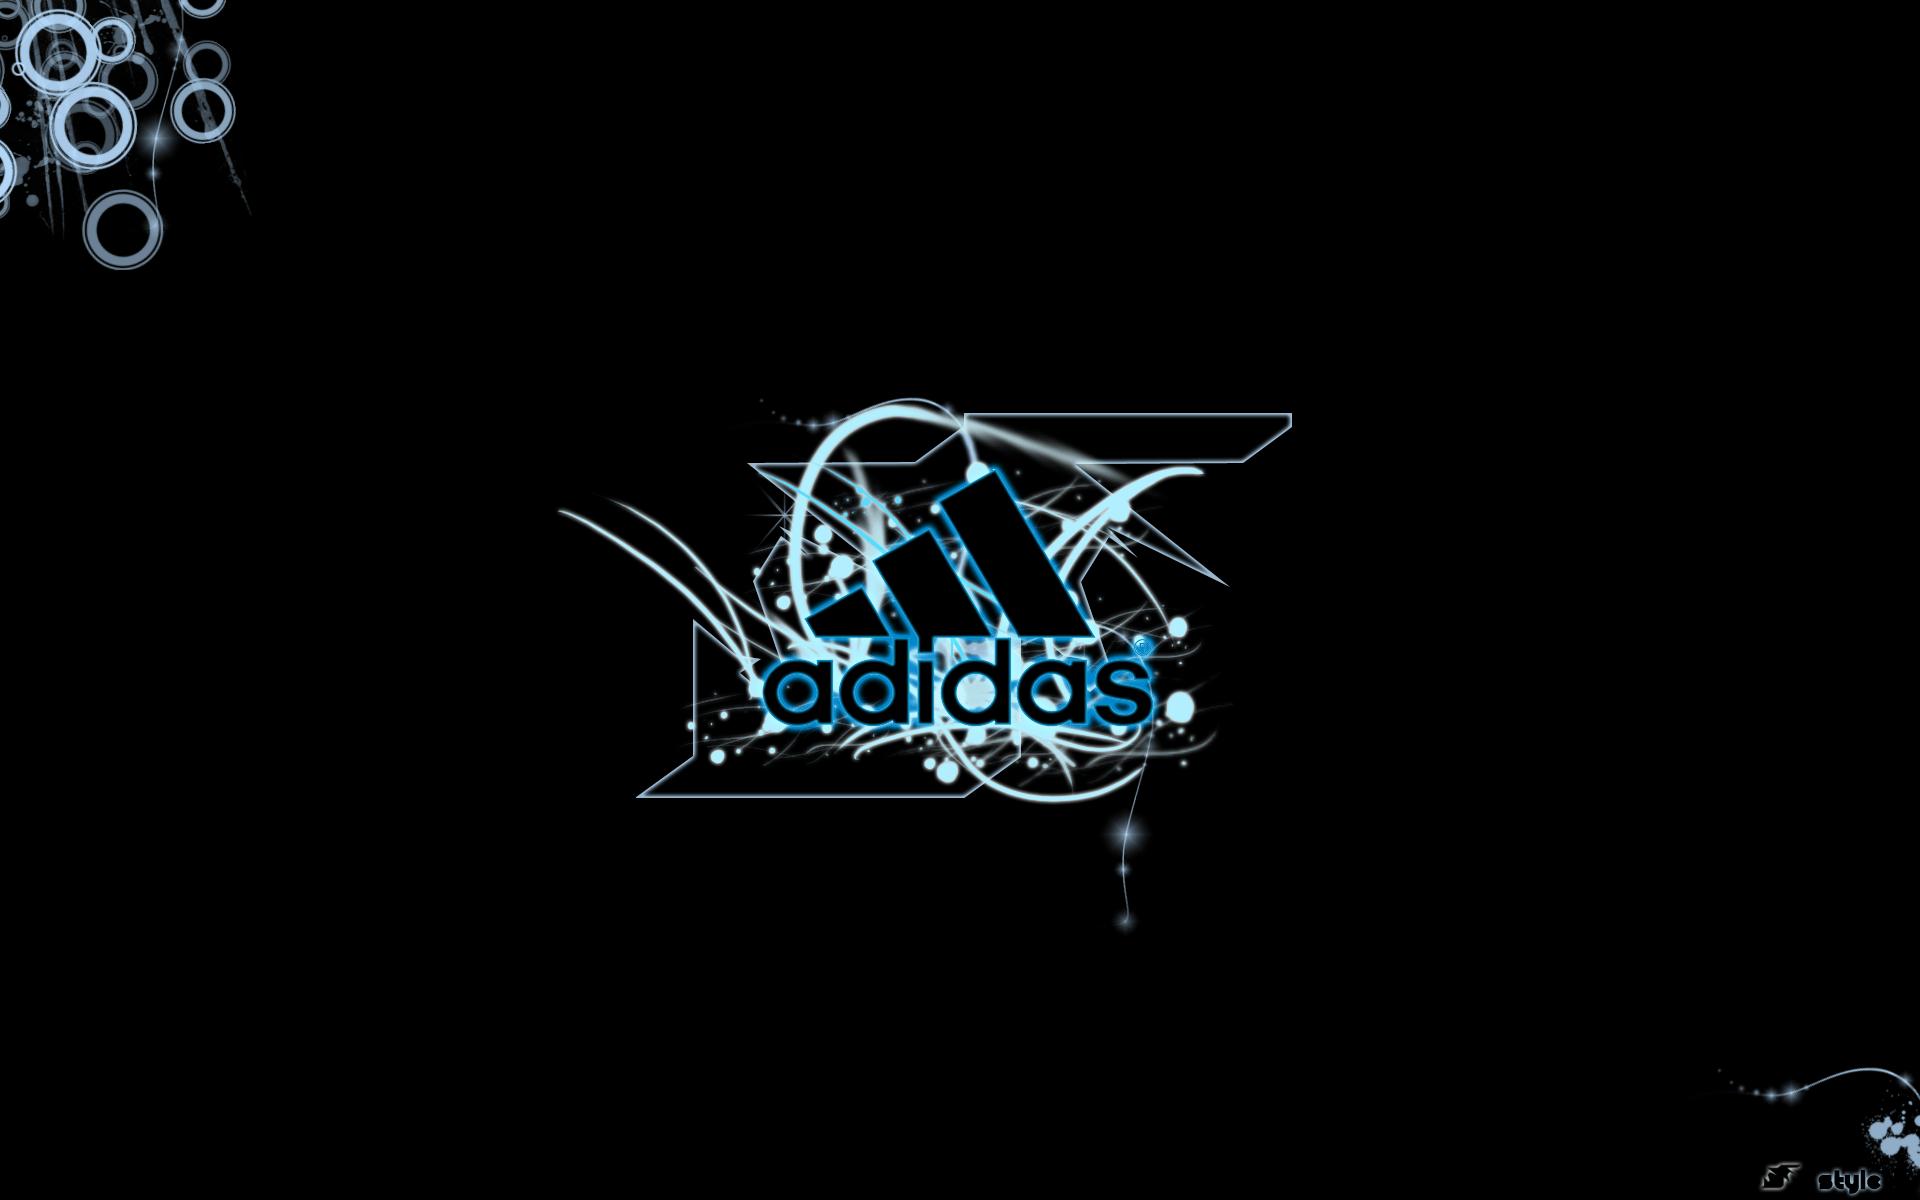 Adidas Full Hd Wallpapers Wallpaper Cave